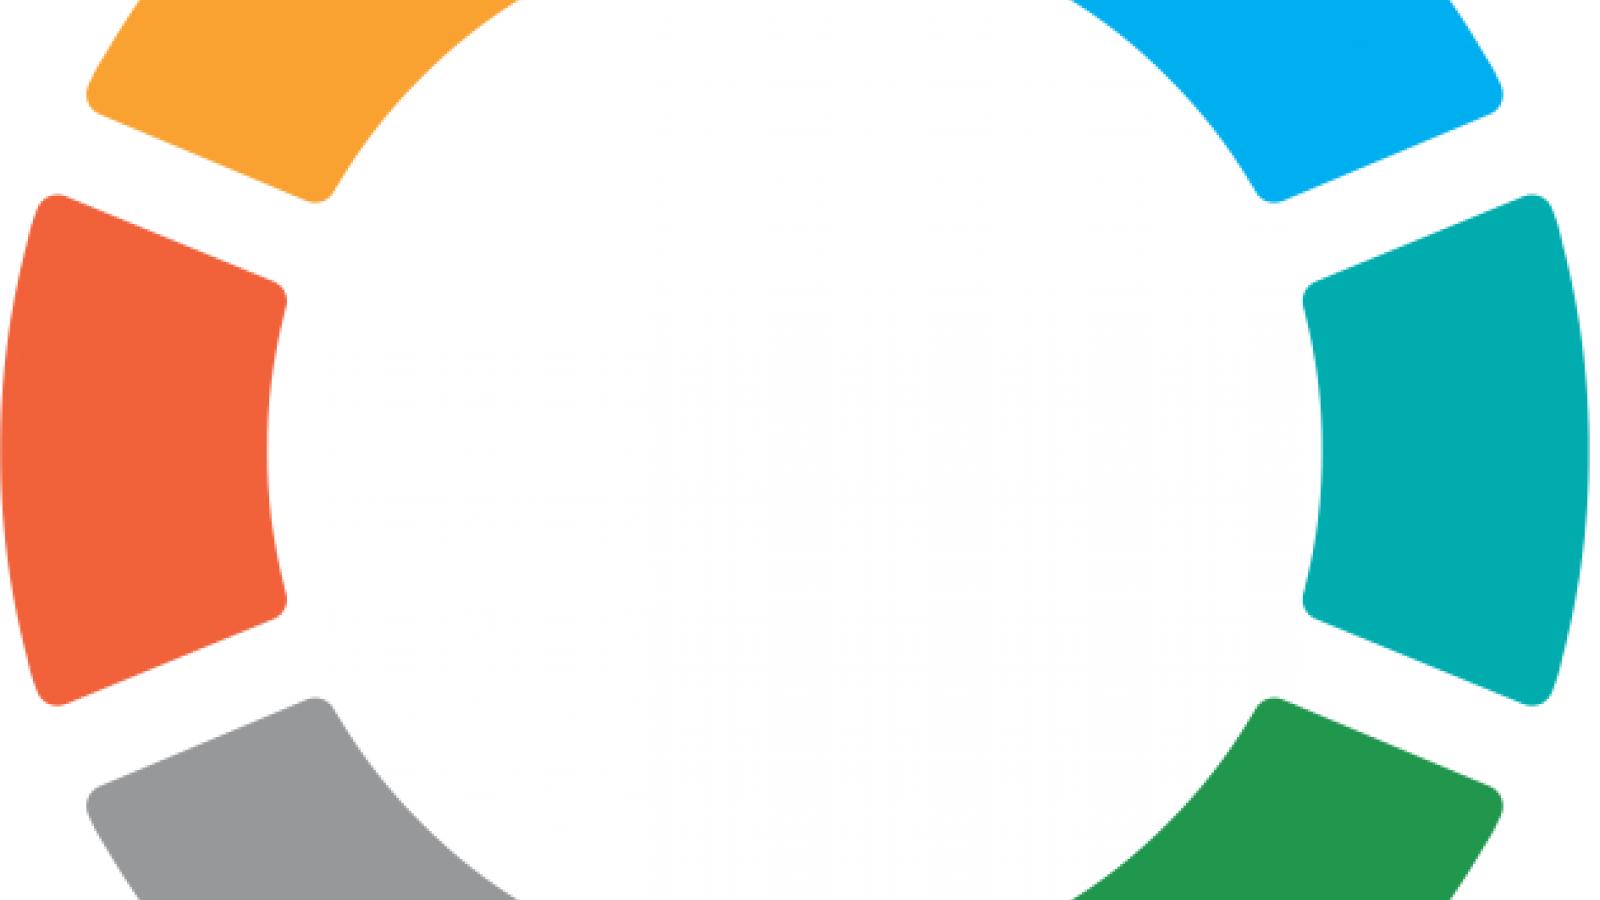 Logo del IPRODICH - solo el dibujo